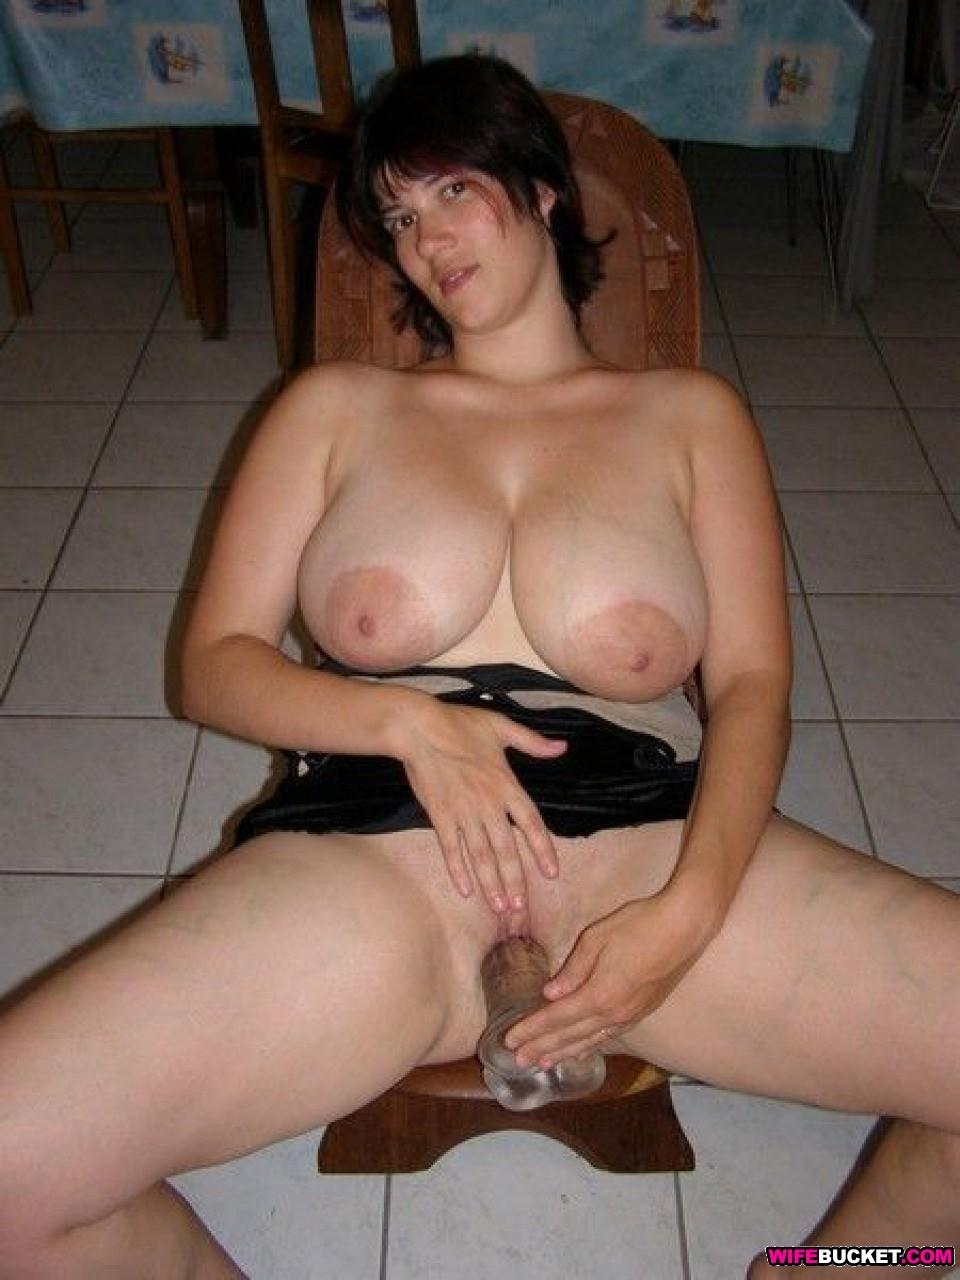 Big boob amature wife